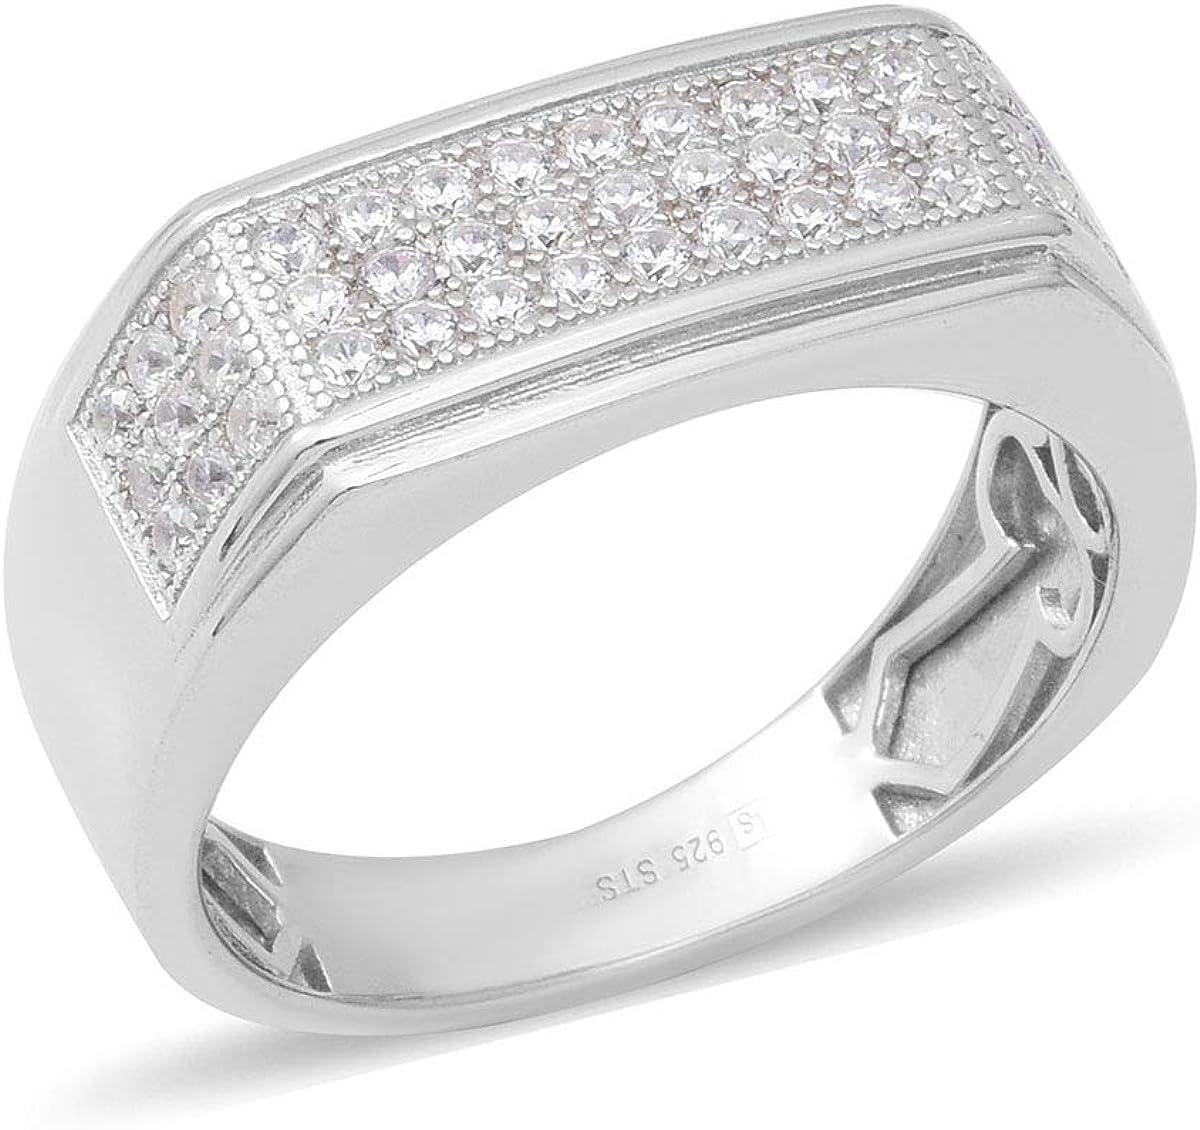 Shop LC Delivering Joy Silvertone Round Cubic Zircon CZ Blue Statement Ring for Women Cttw 0.8